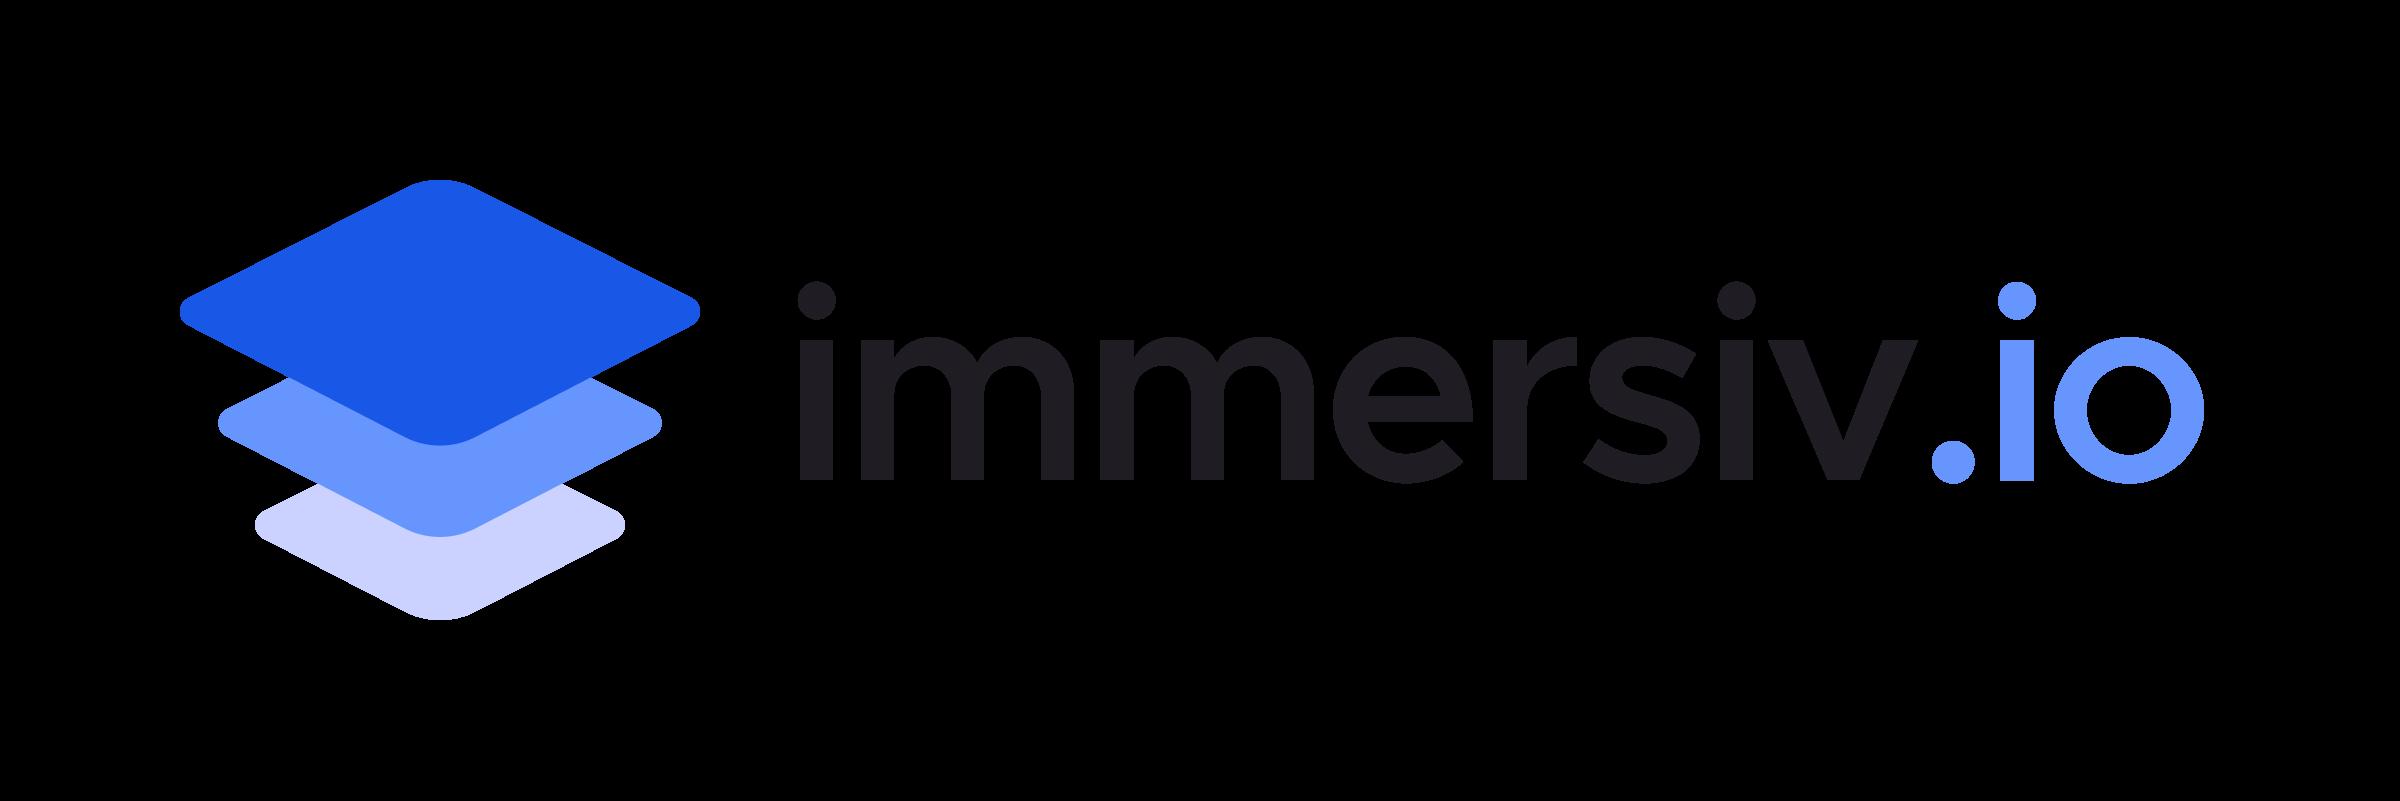 immersiv-io-logo-laval-1